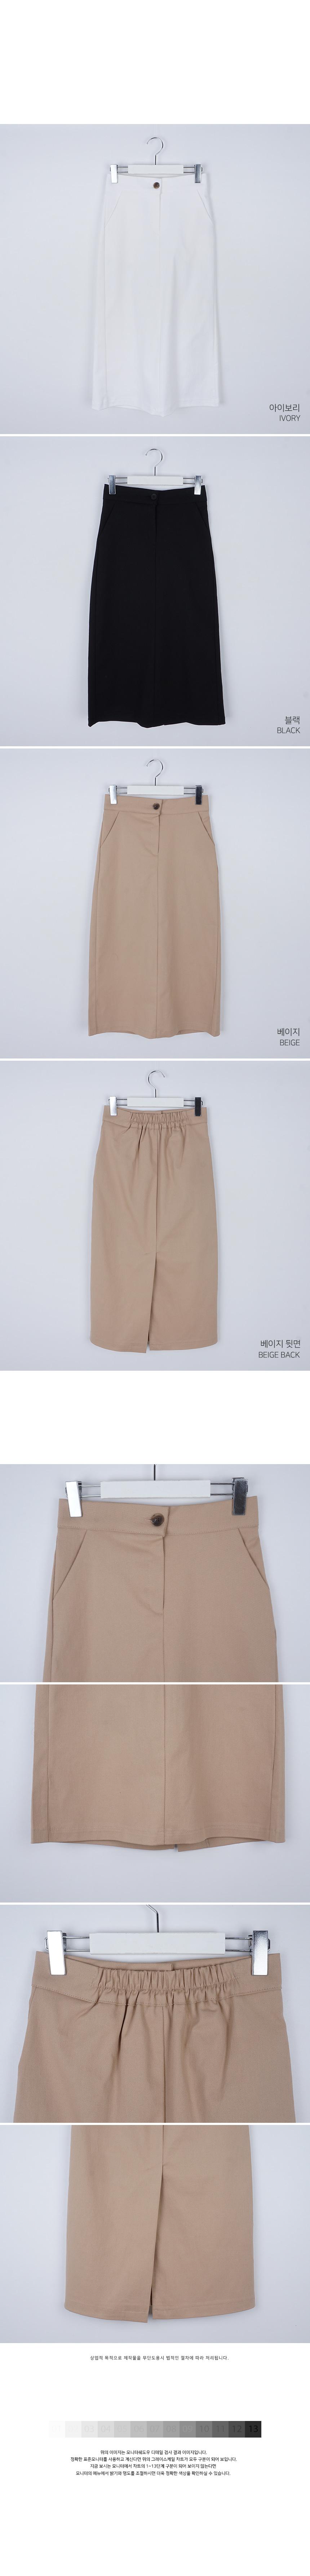 Jaber cotton long skirt